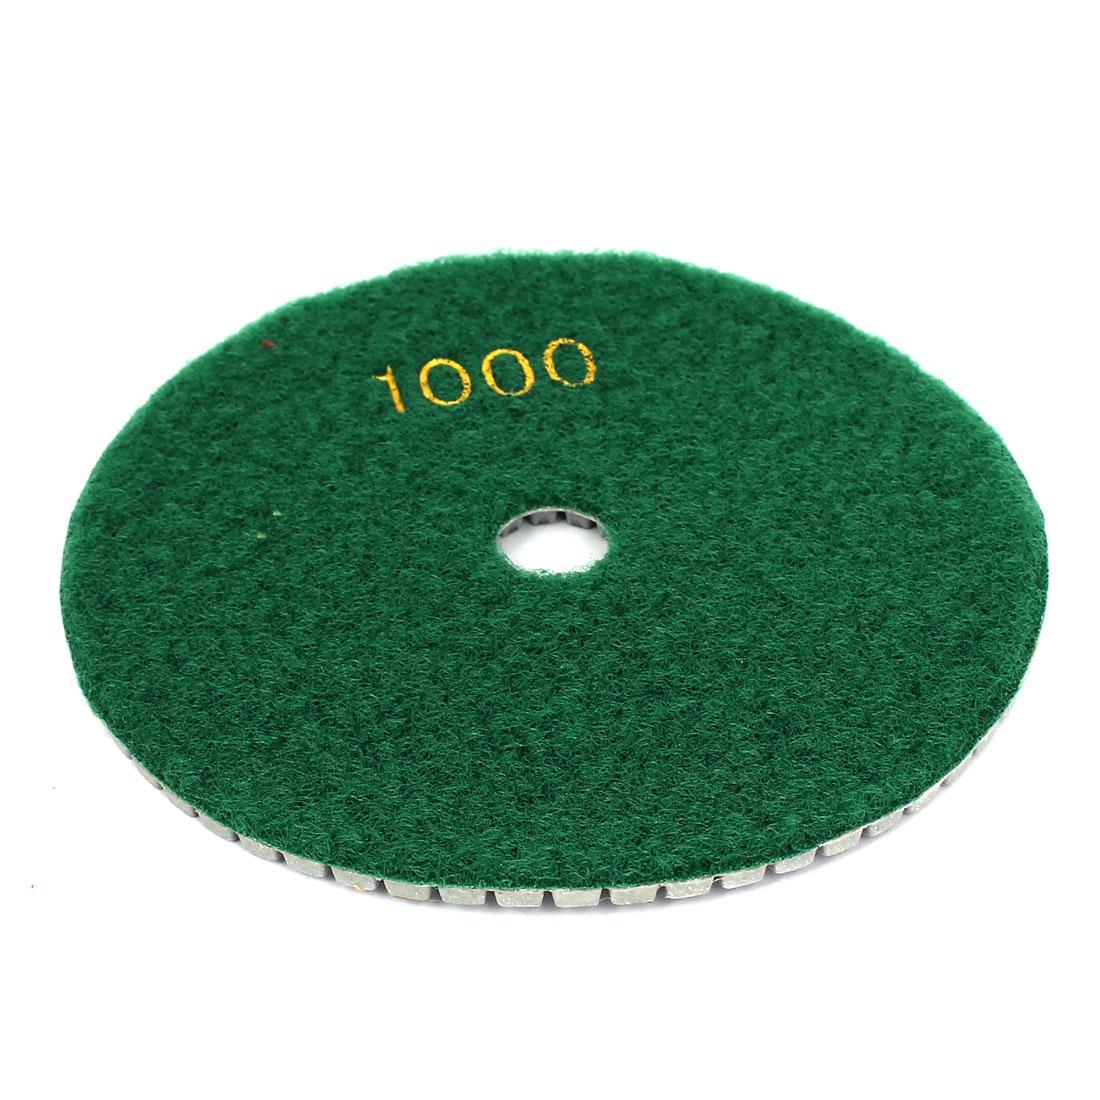 Concrete Marble Wet Dry Diamond Polishing Buffer Pad Disc 1000 Grit 125x15mm